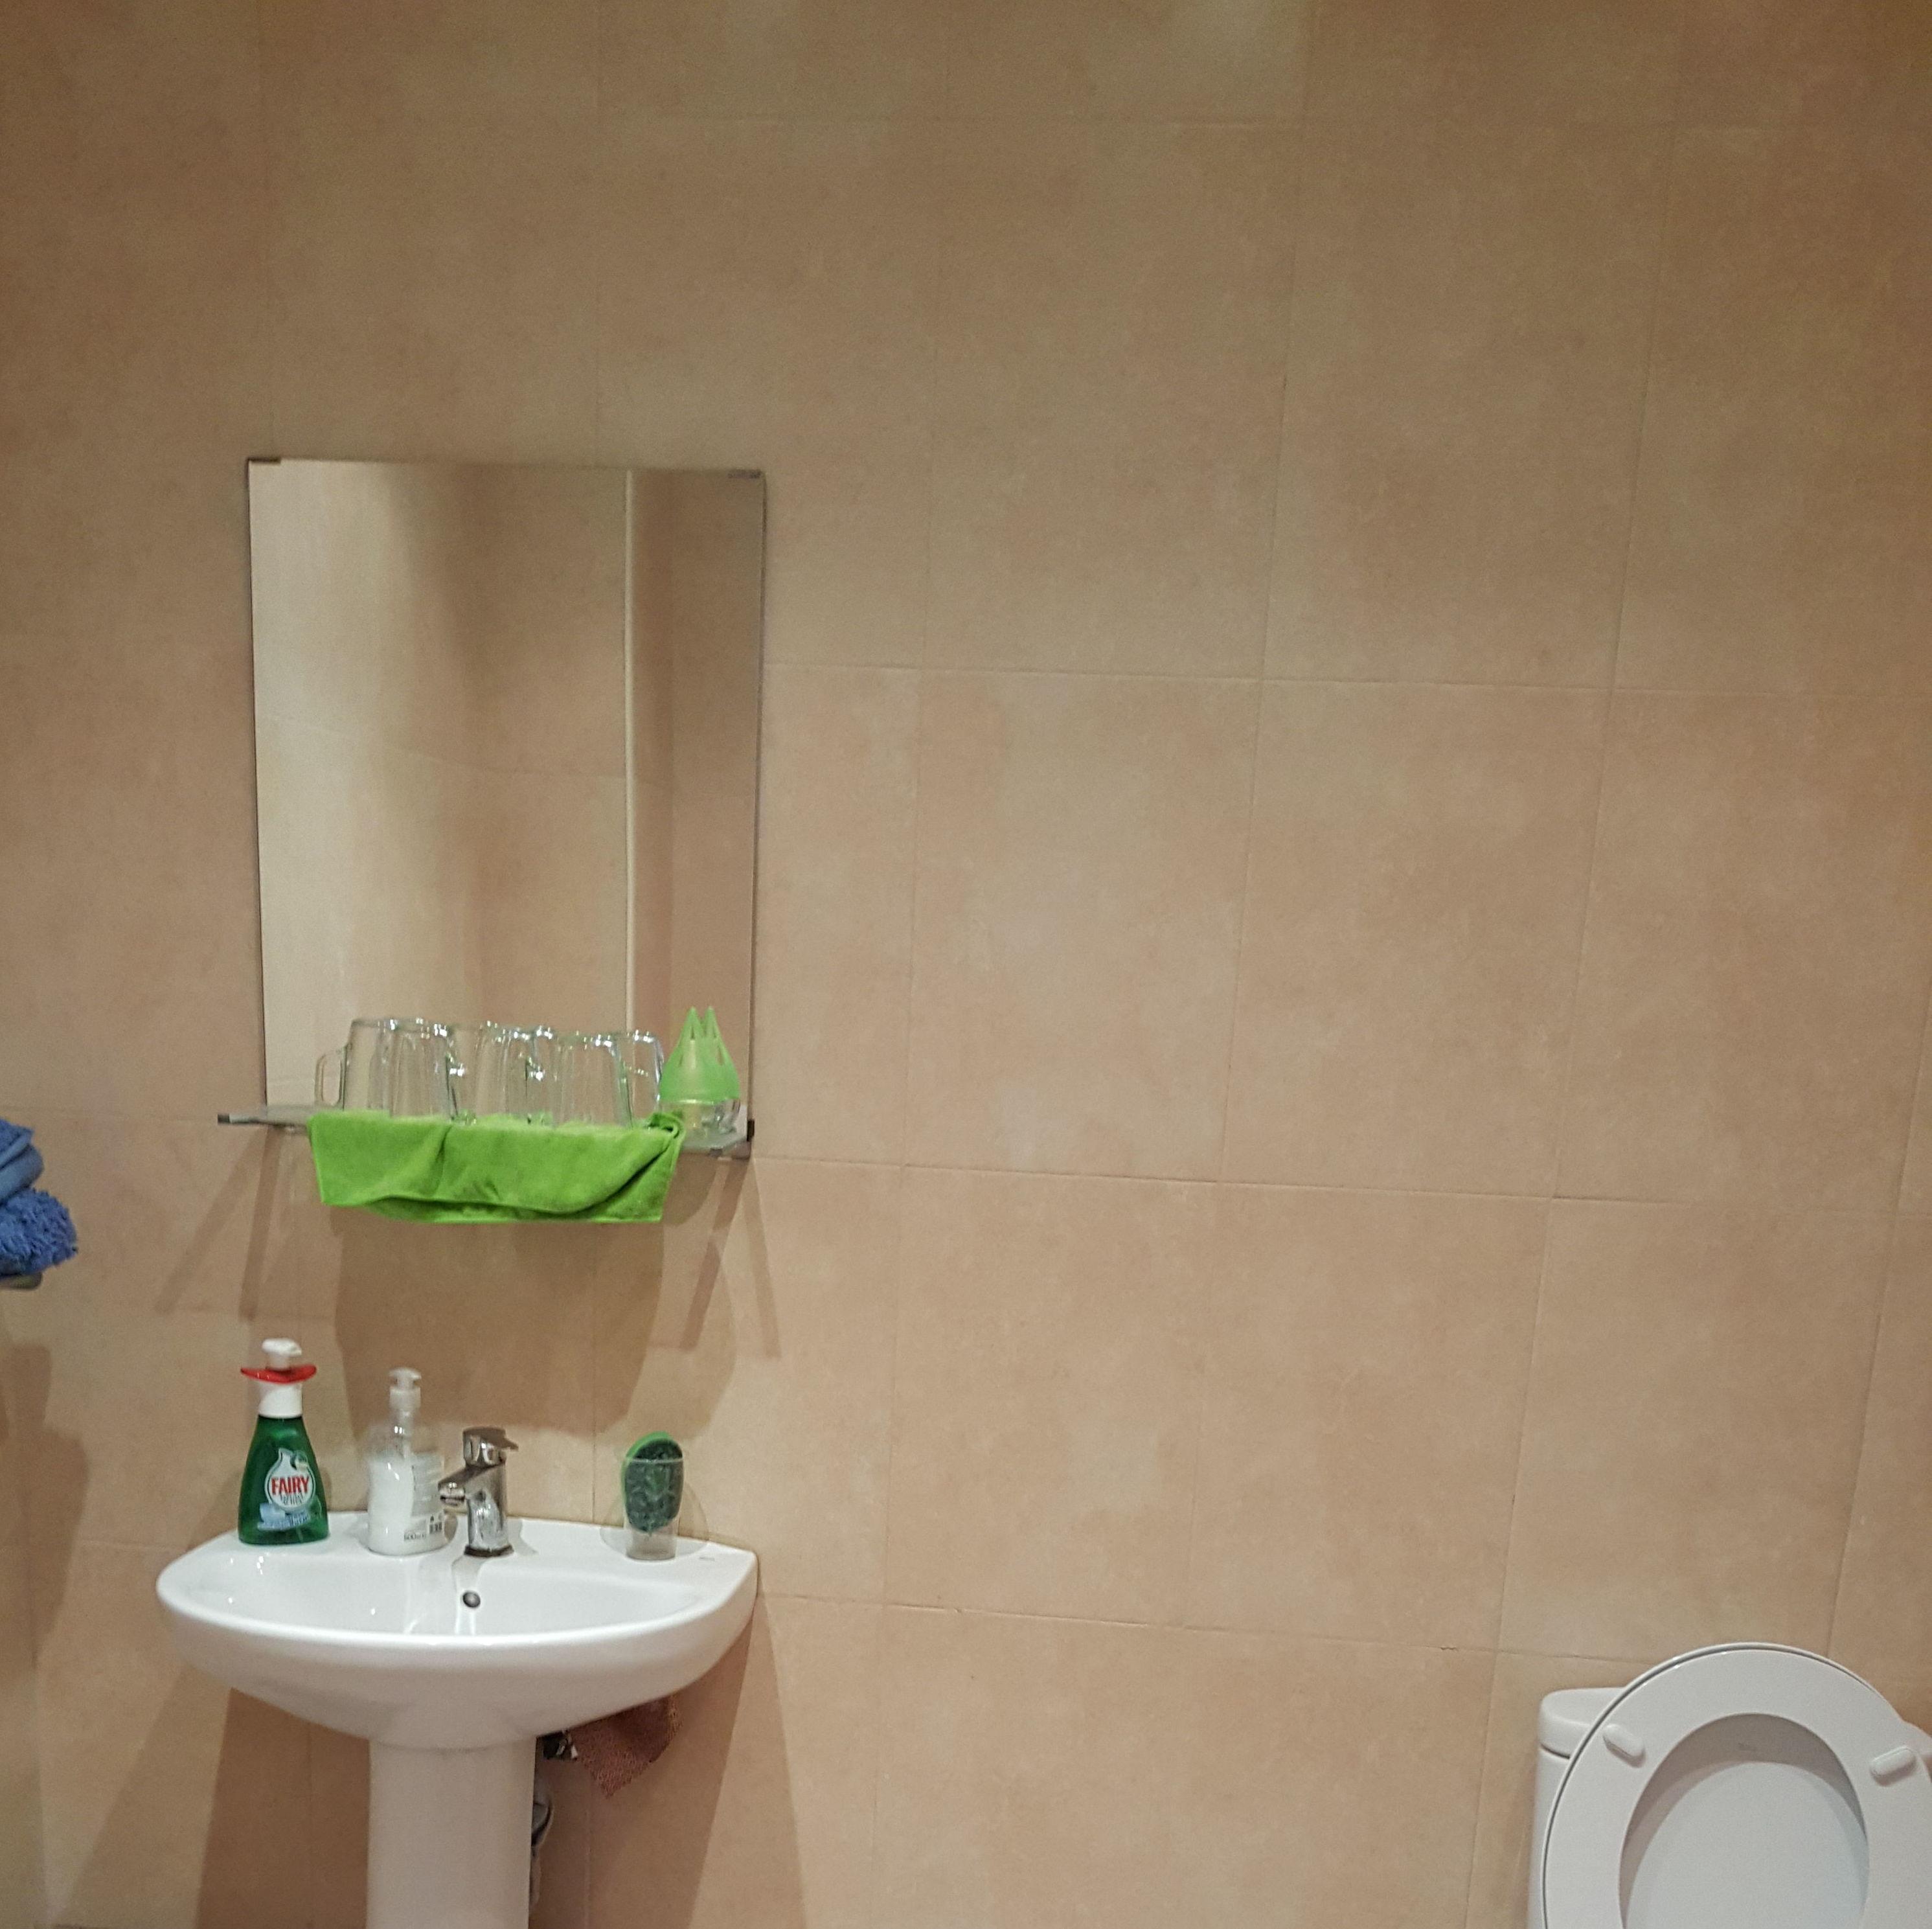 Foto 12 de Empresas de limpieza en BASOZABAL | Limpiezas La Fragua